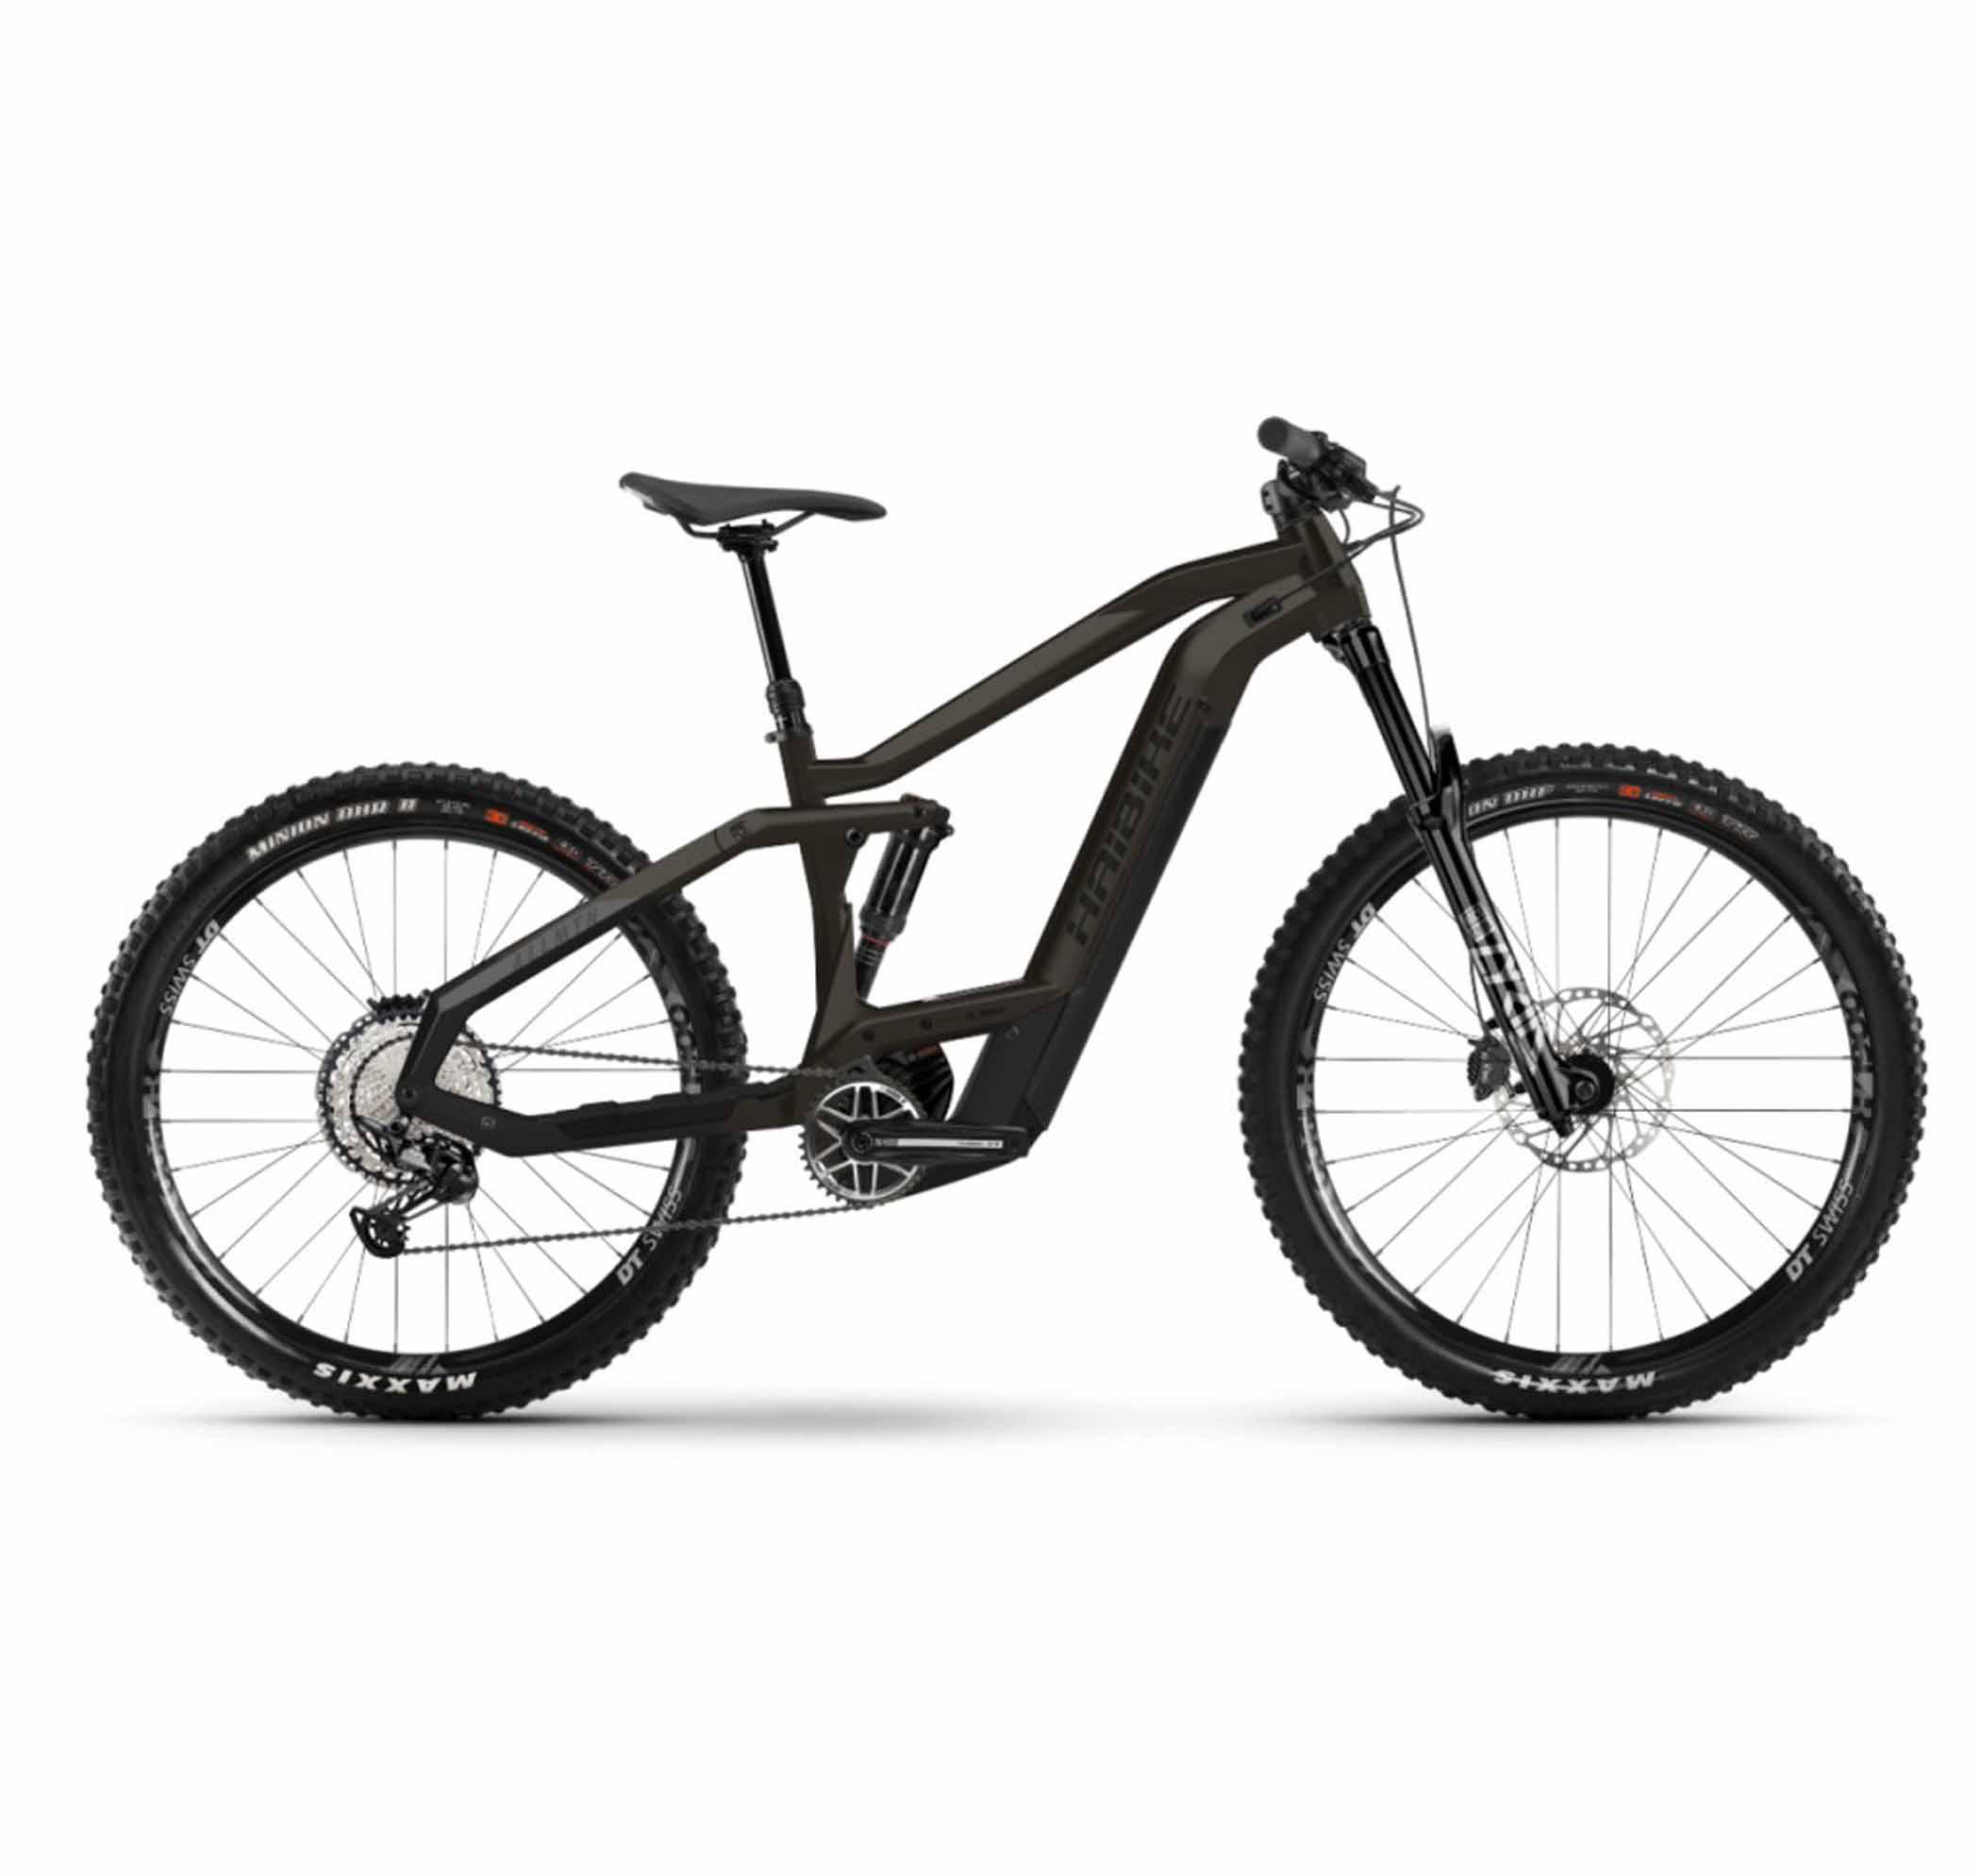 Haibike_Rodeo_Bike_Bosch_Allmtn_5_Black